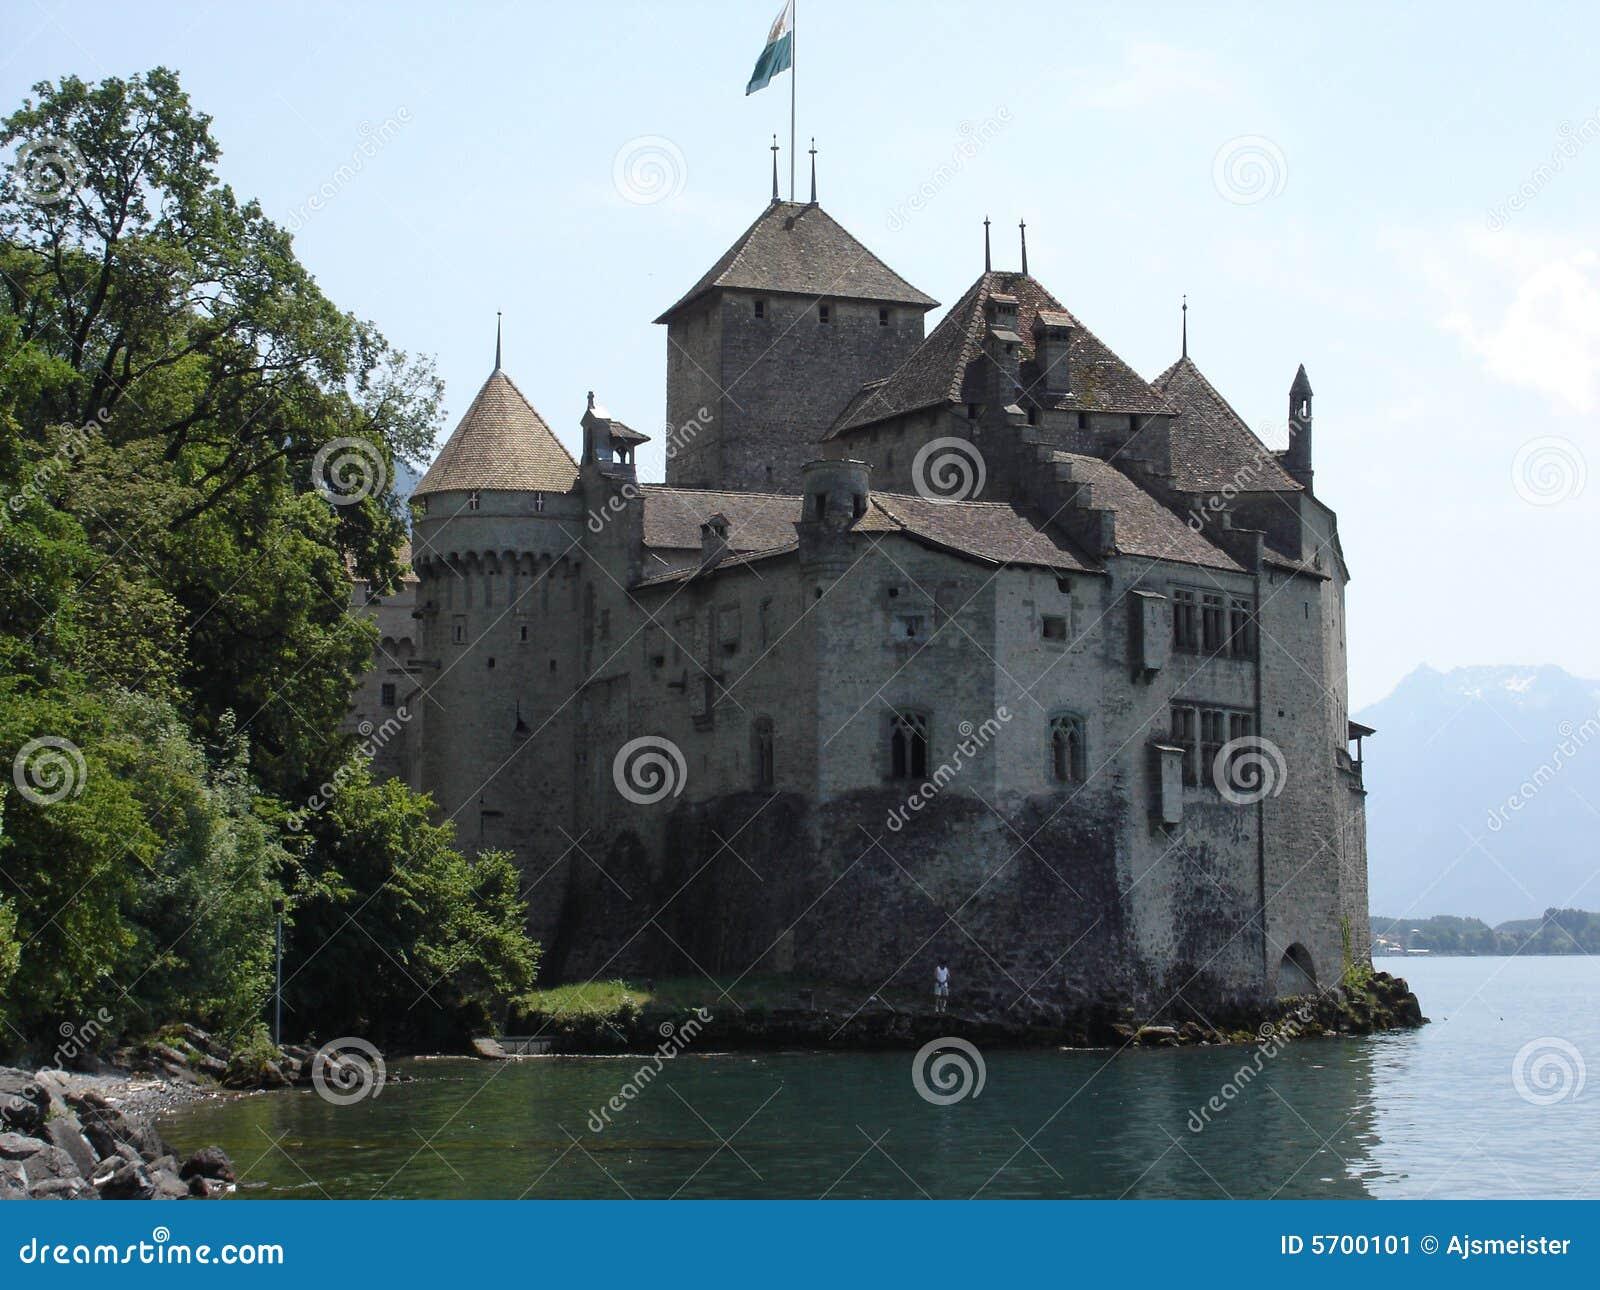 Castle of Chillon at Montreau, Switzerland